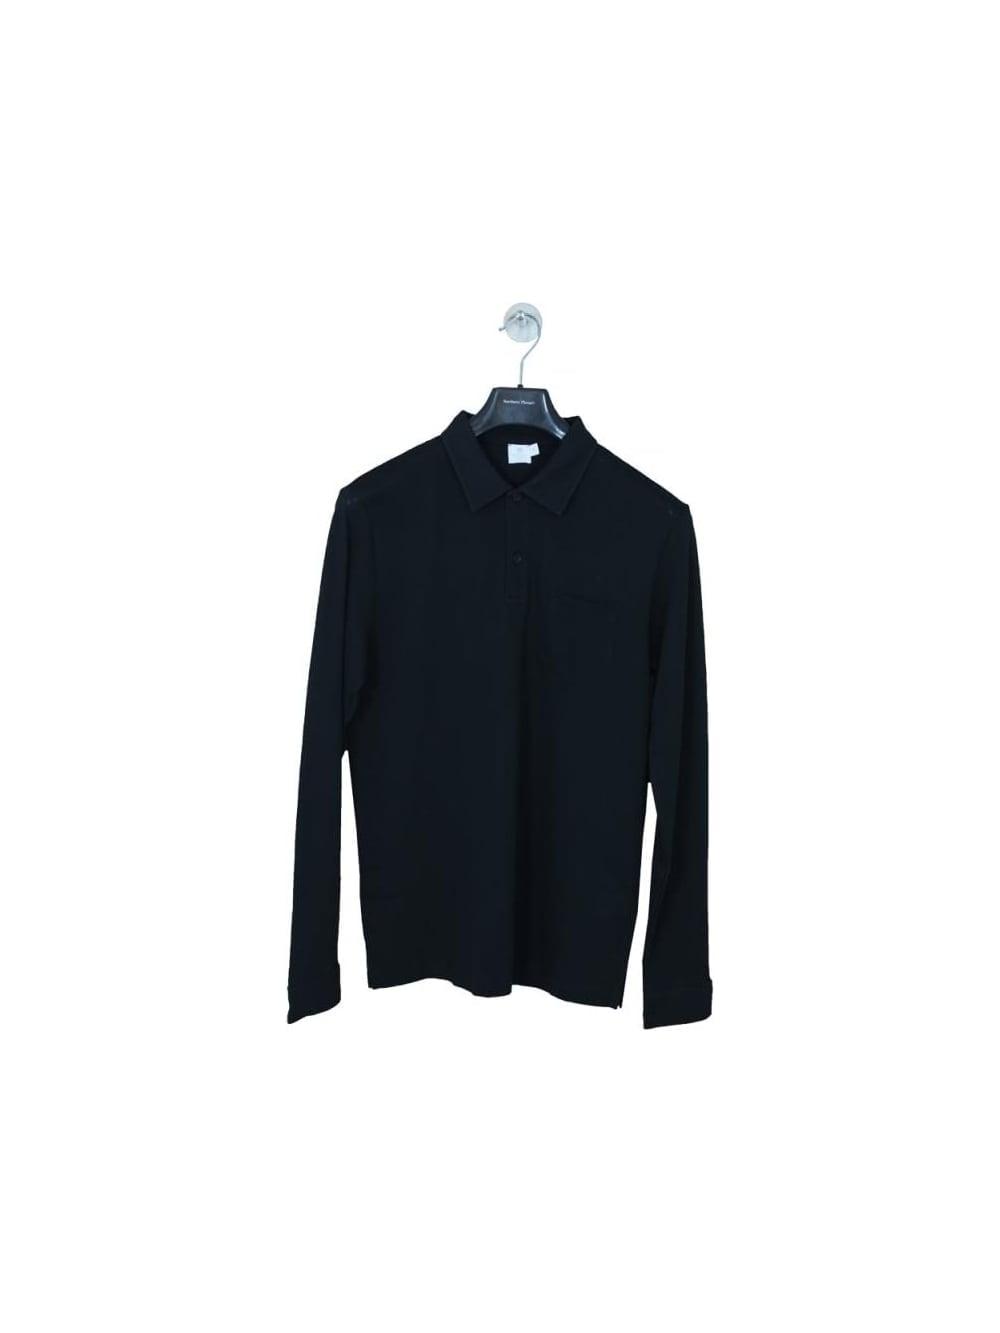 95788f0b32ec Sunspel Long Sleeve Riviera Polo in Black - Northern Threads